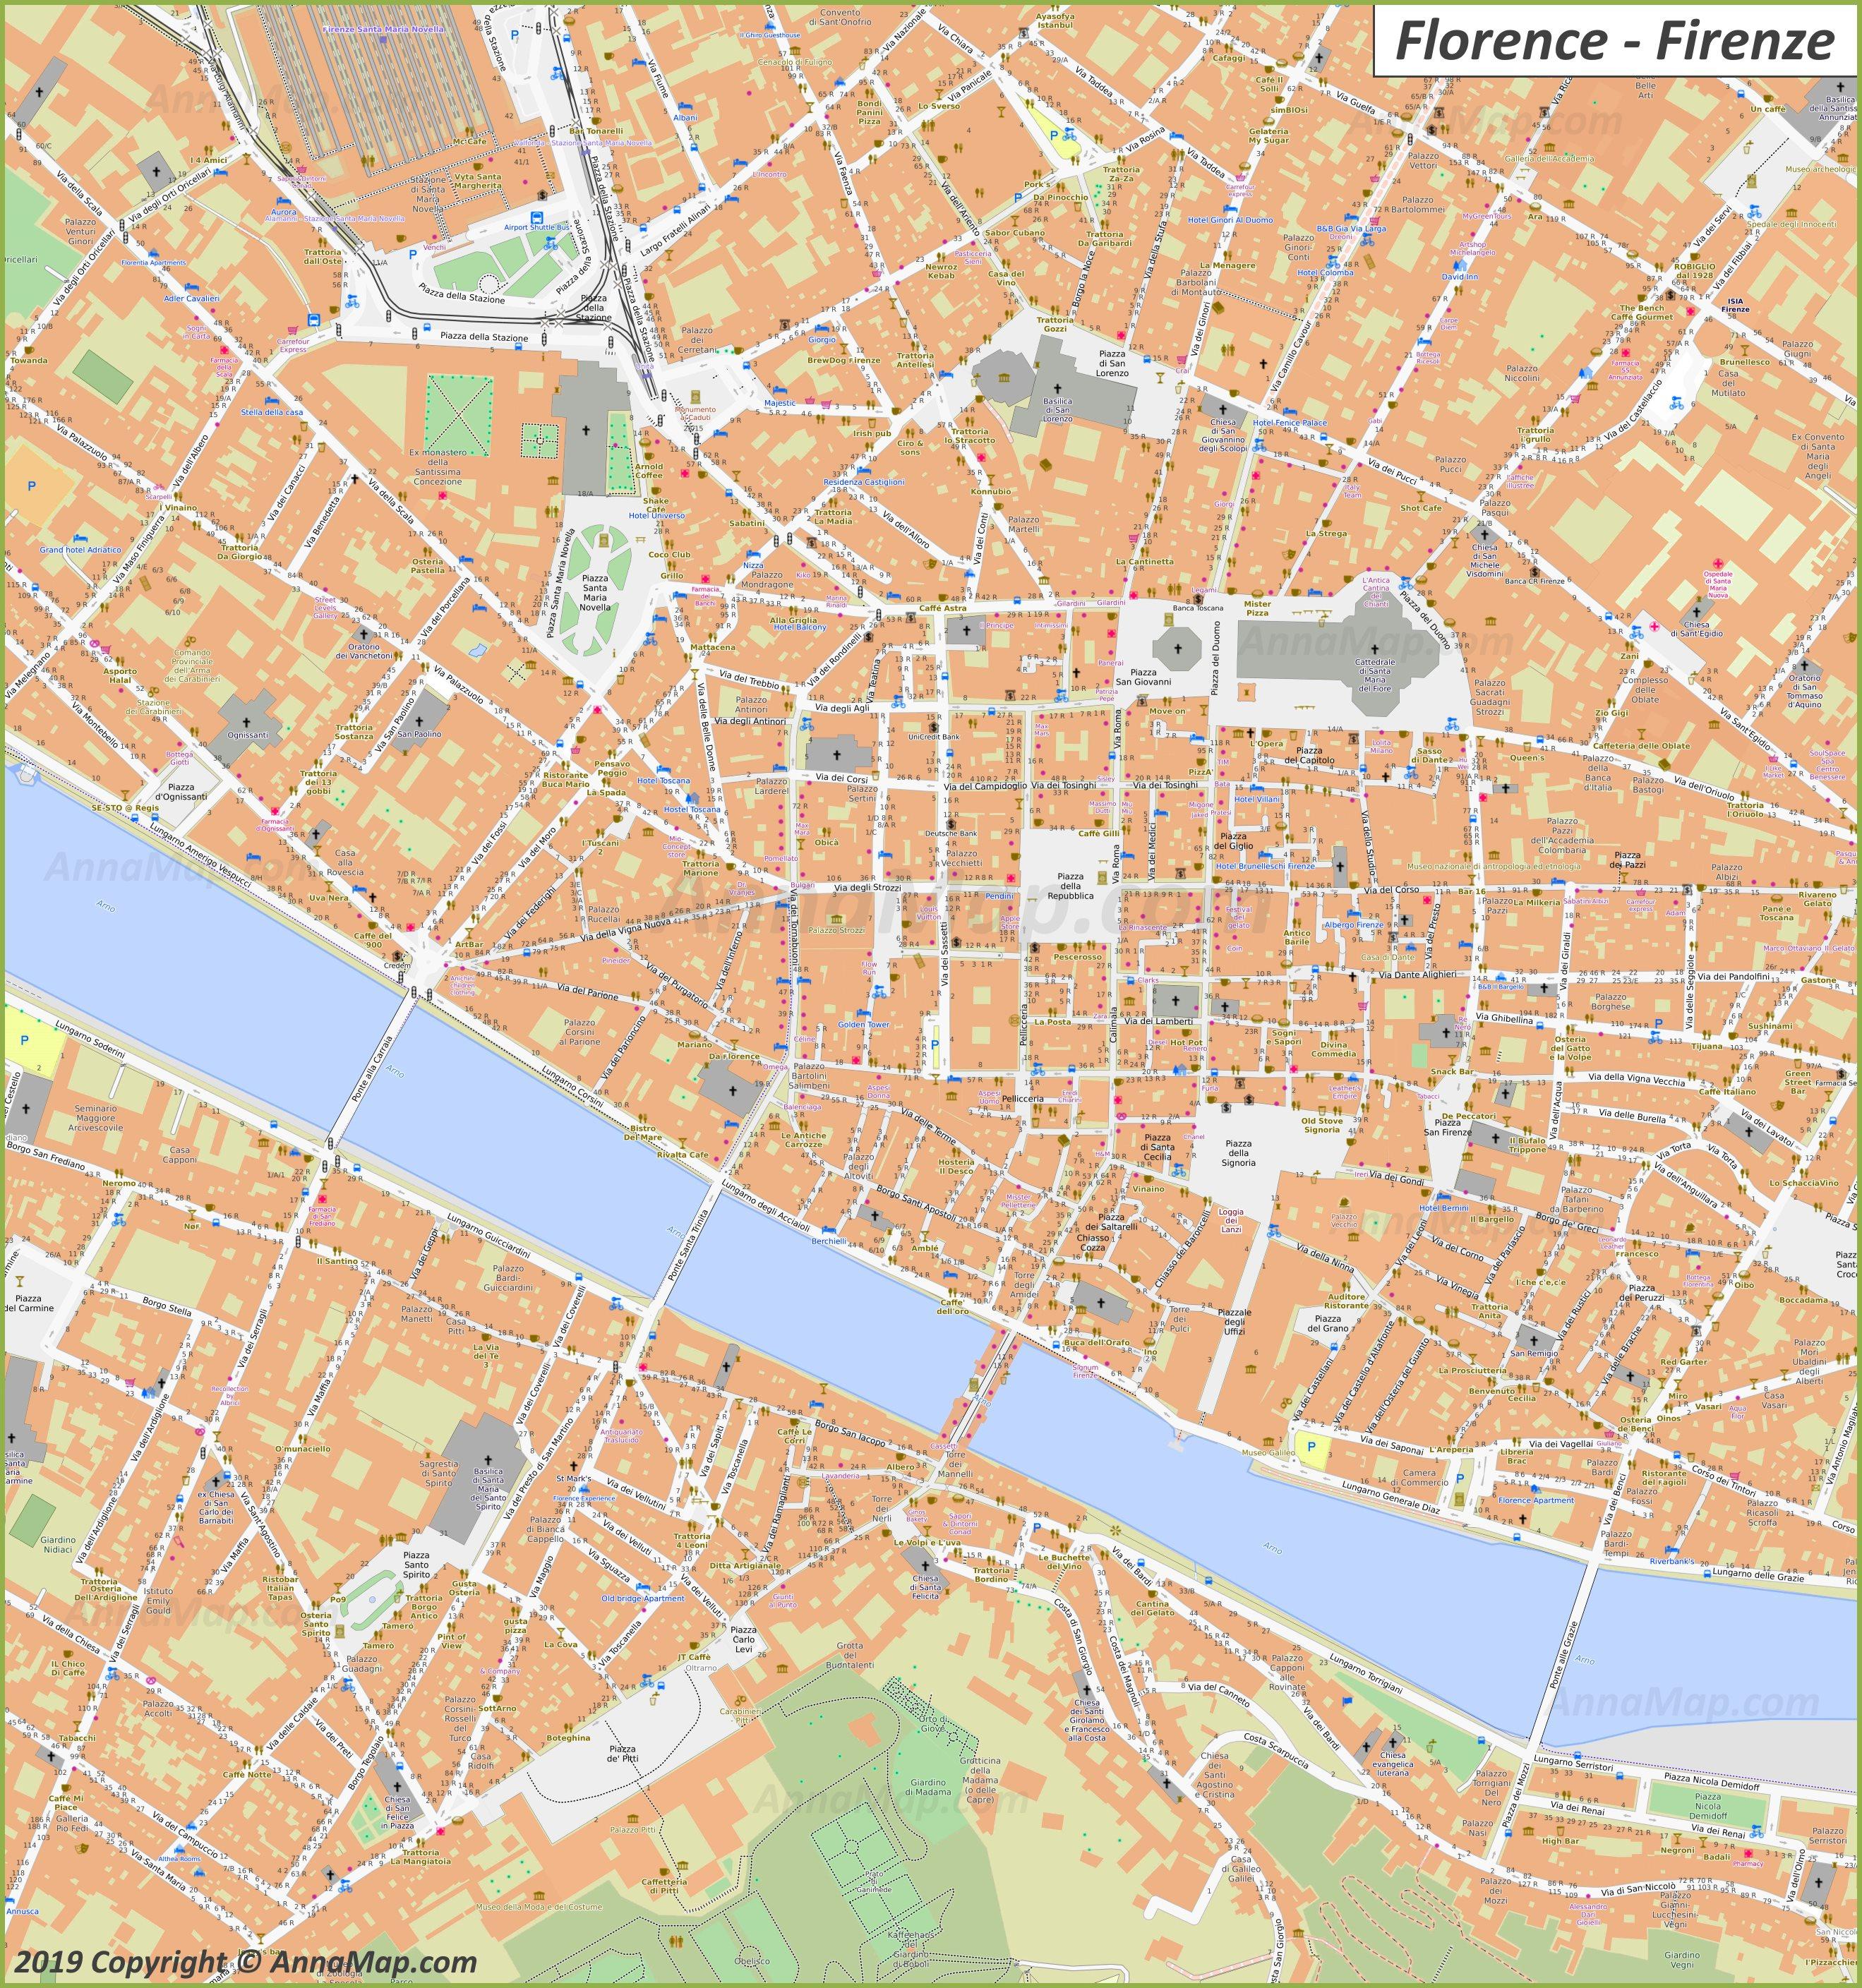 Firenze Cartina Centro Storico.Mappe Turistiche Dettagliate Di Firenze Italia Mappe Stampabili Gratuite Di Firenze Annamappa Com